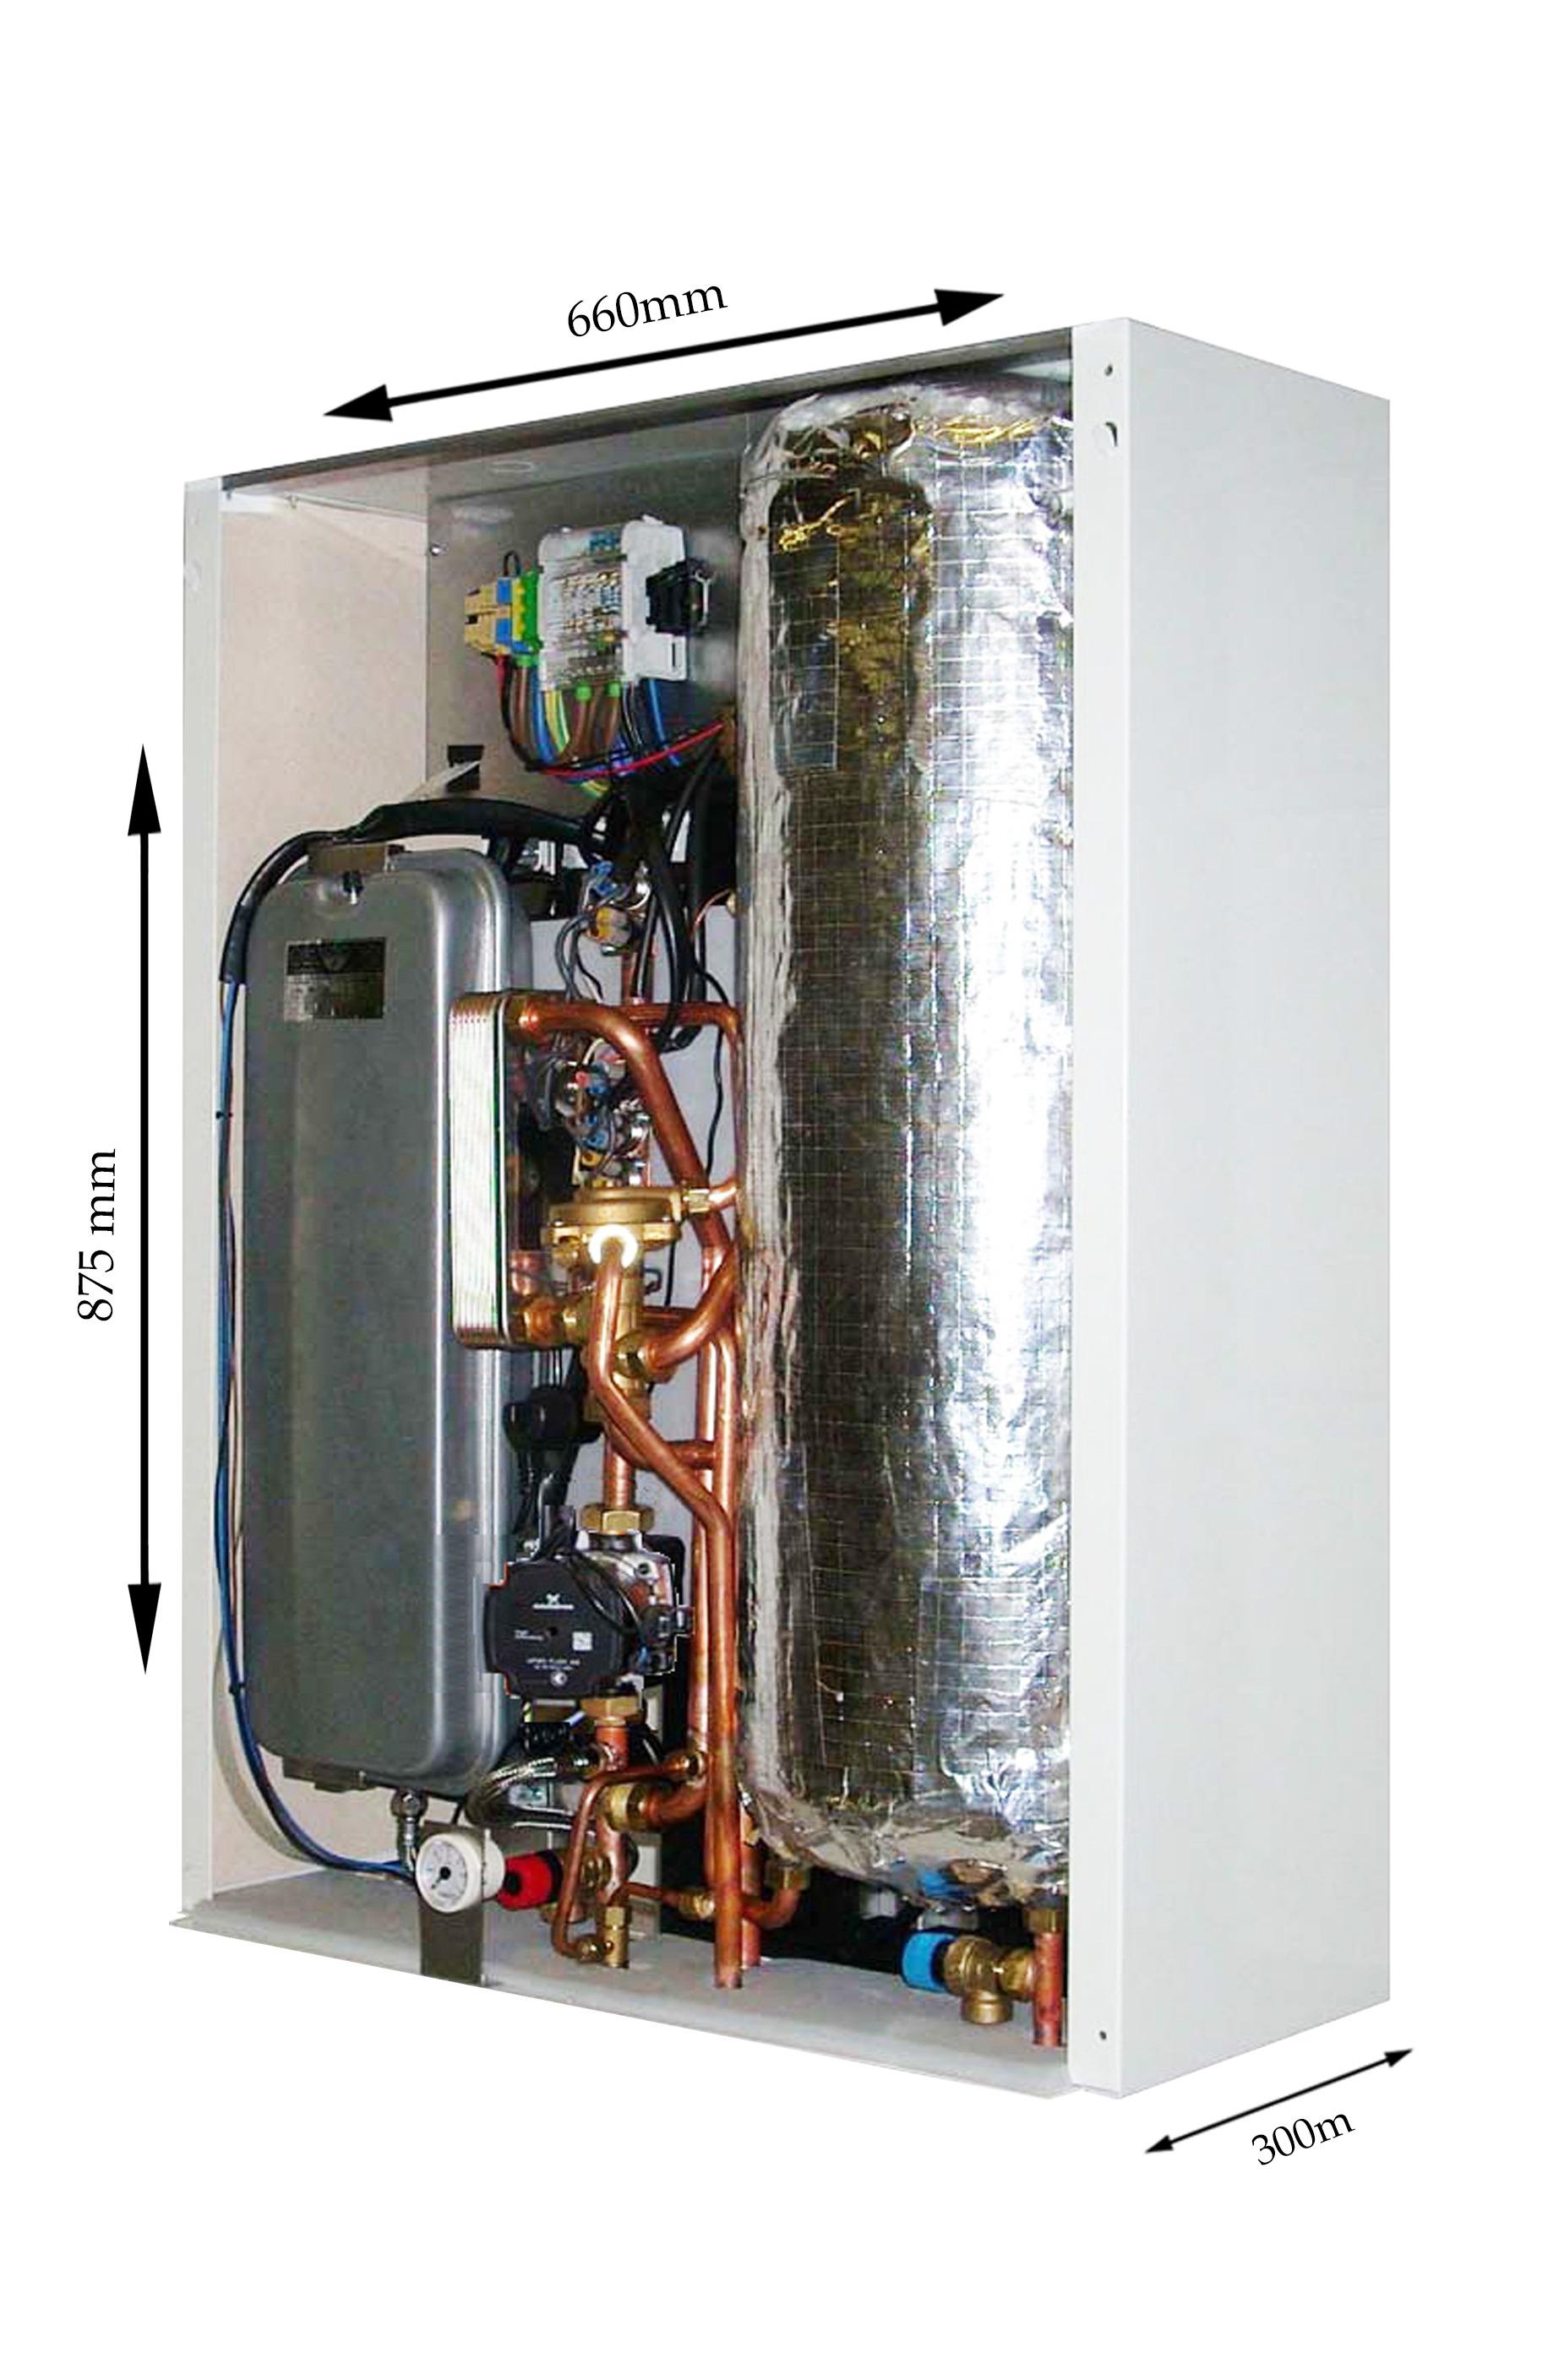 Ek Bp 12kw Electric Combi Boiler With Inbuilt Cylinder